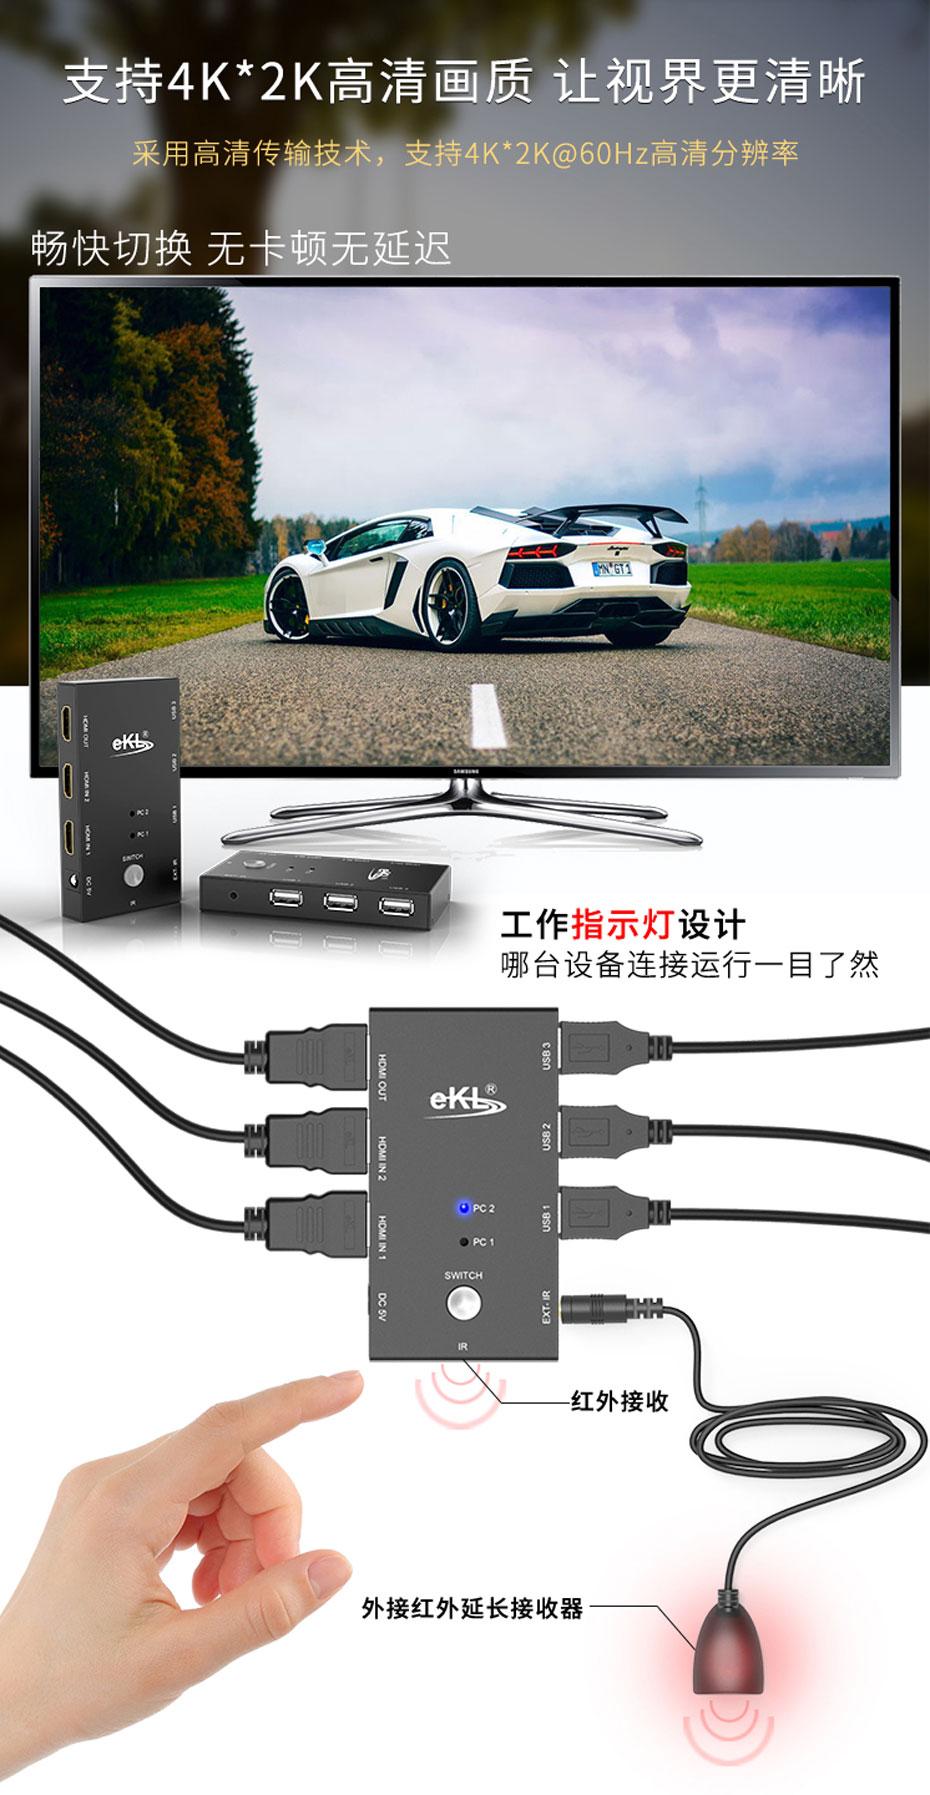 HDMI2.0 KVM切换器二进一出21HA支持4k*2k高清画质